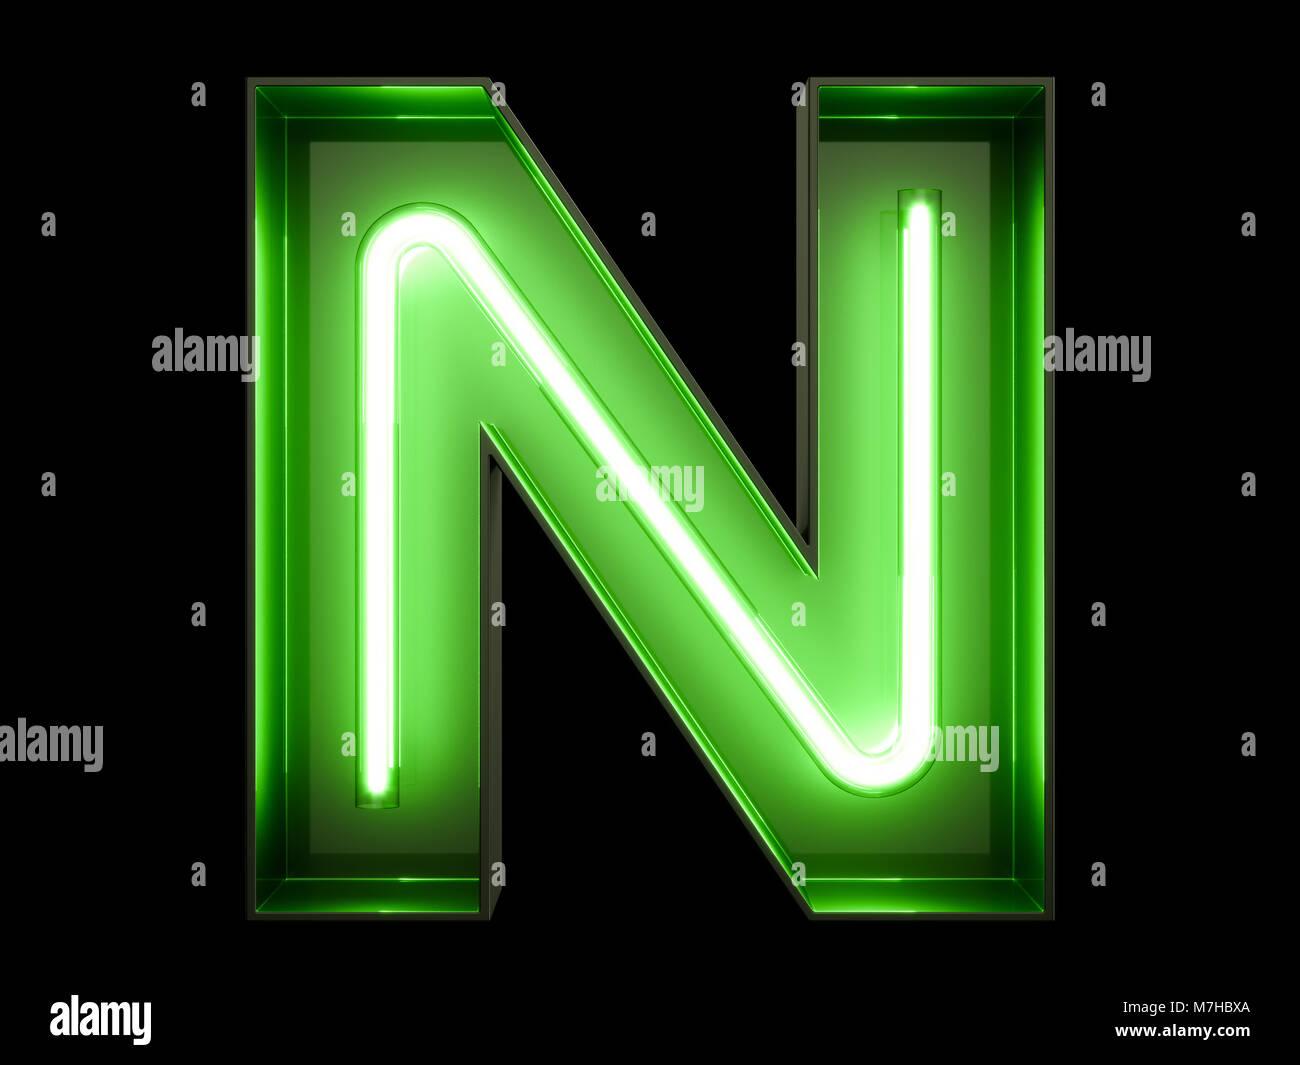 Il Neon Luce Verde Alfabeto Carattere Font N Tubo Al Neon Lettere